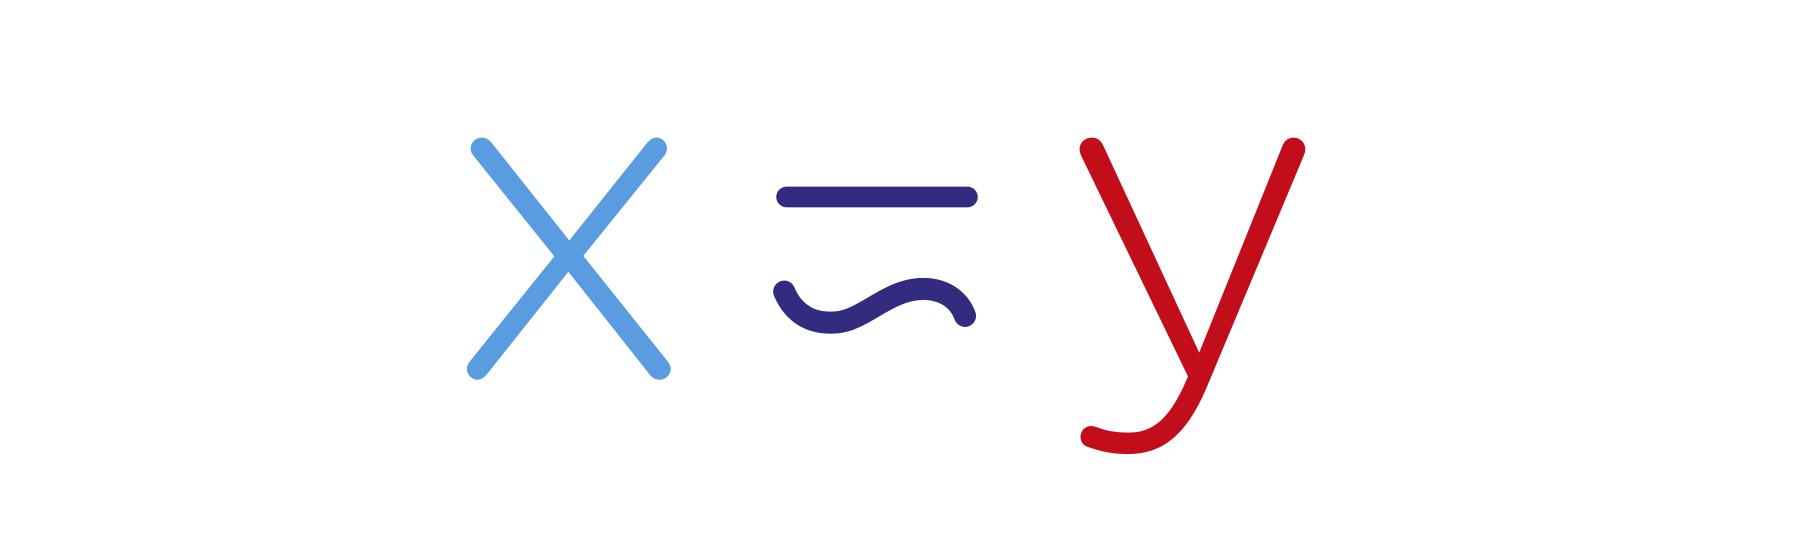 X is Y